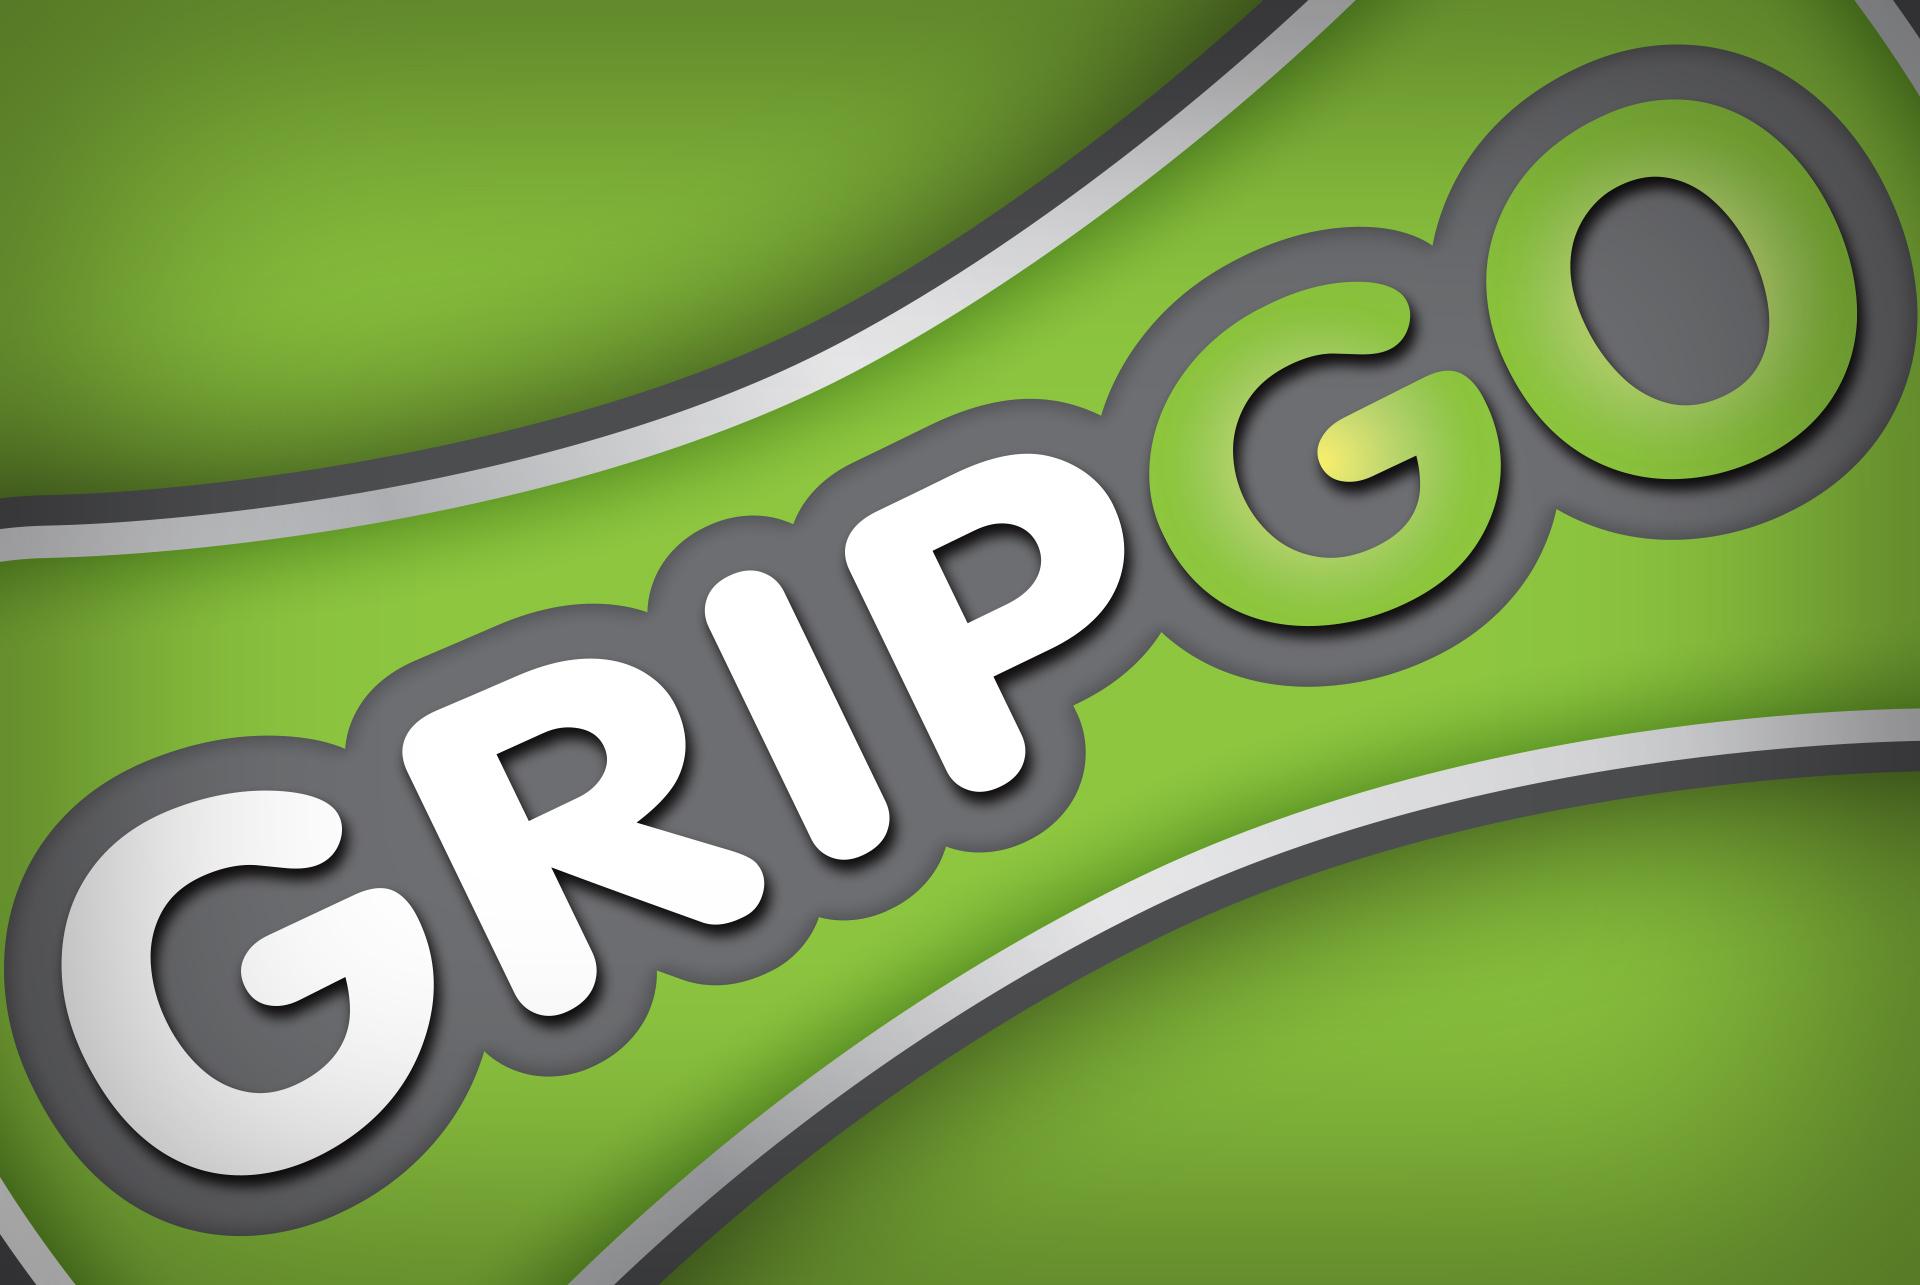 Gripgo®